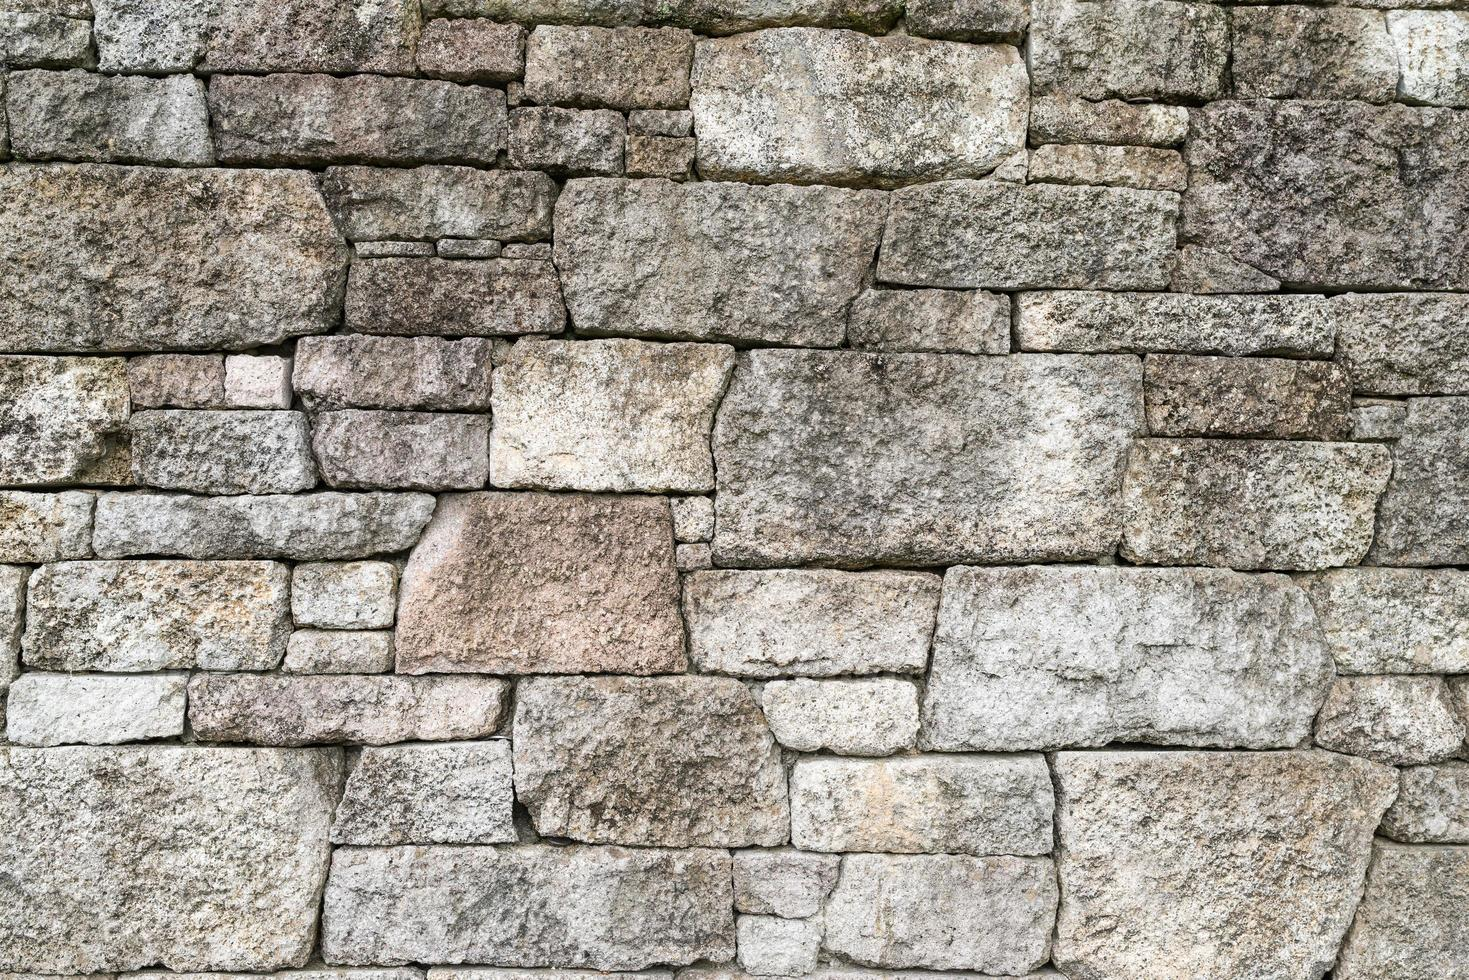 blocos enferrujados sujos de tecnologia de trabalho em pedra foto